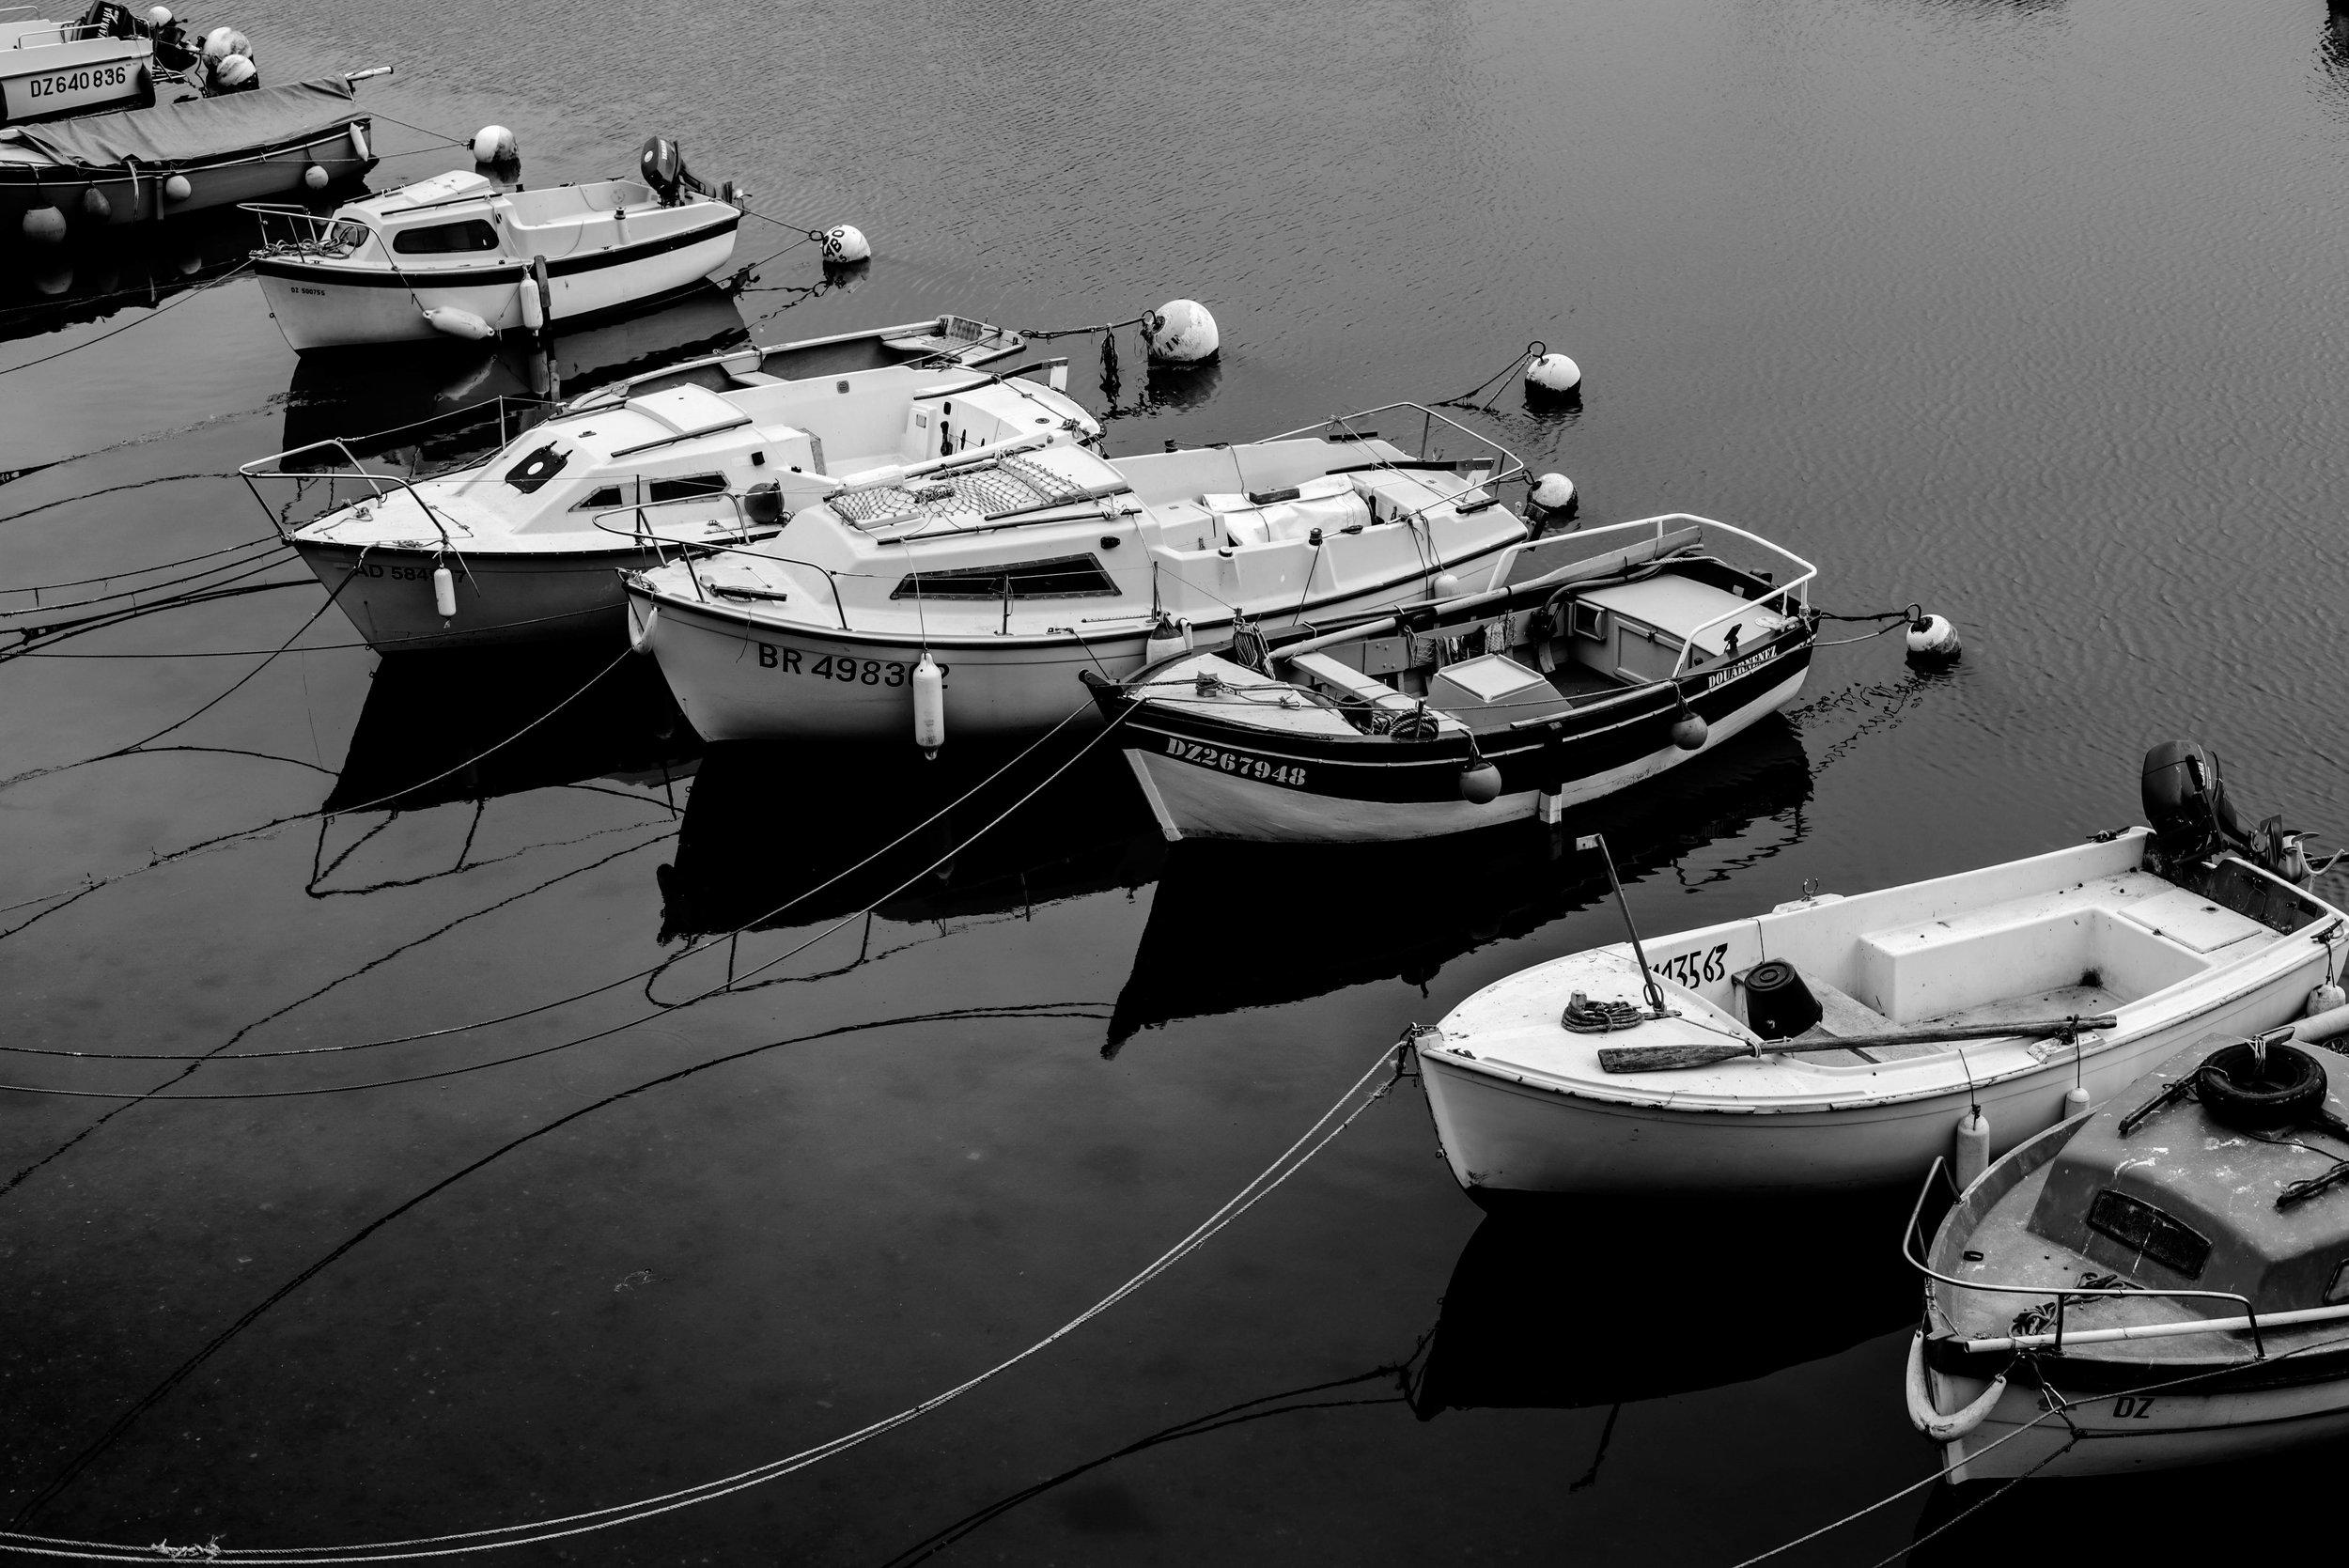 Blackandwhite boats.jpg